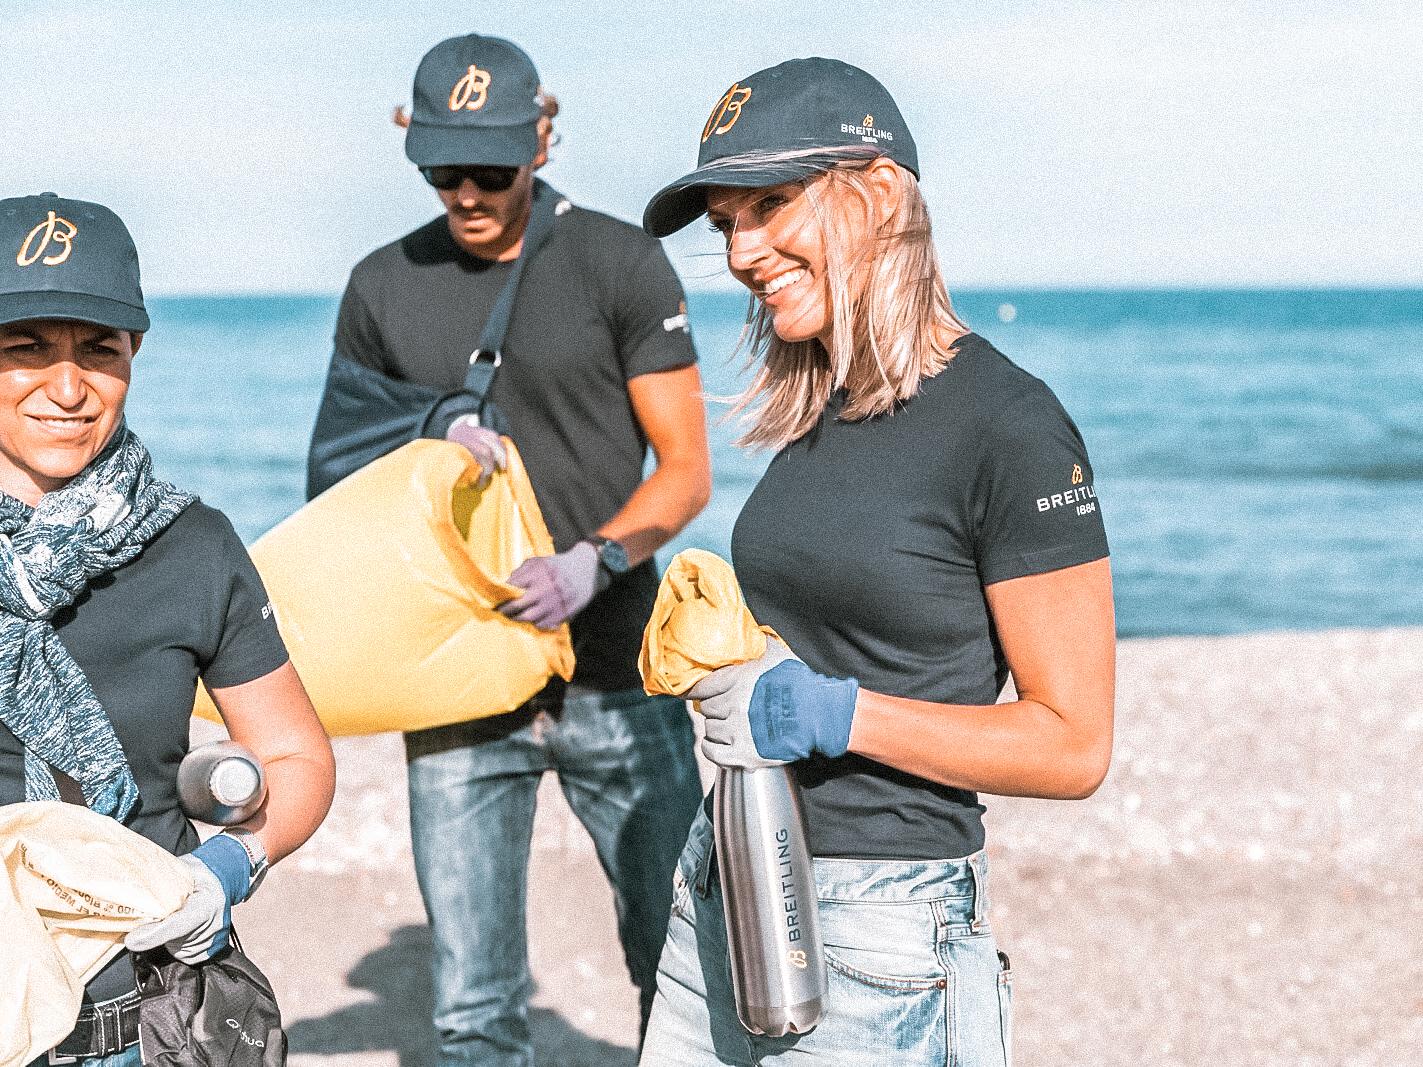 Breitling – World Ocean Day Marbella June 2018